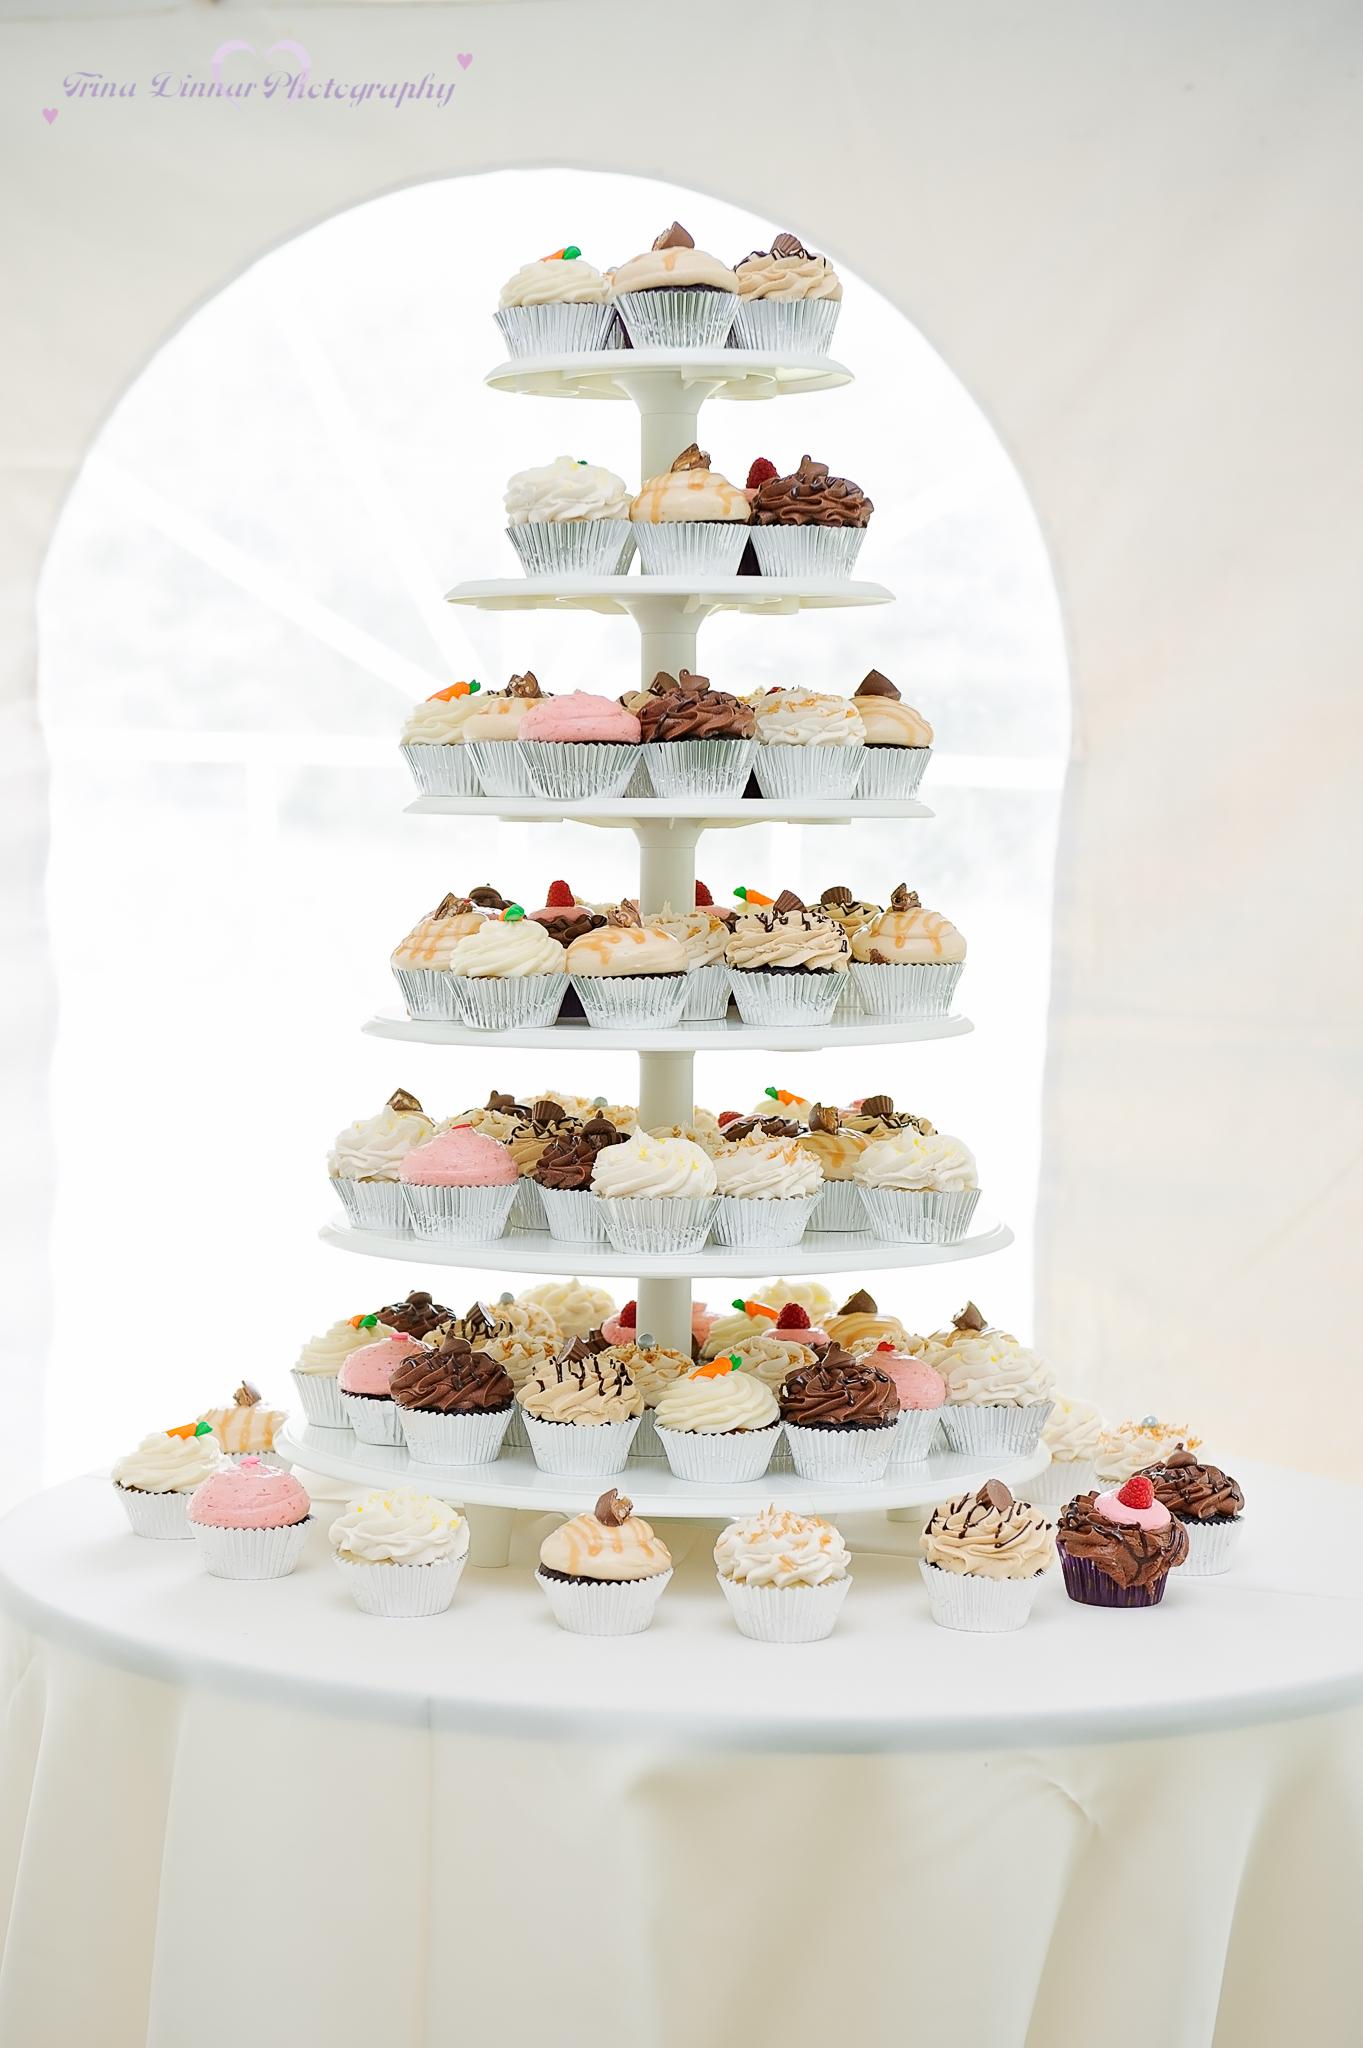 cupcake tiered wedding cake